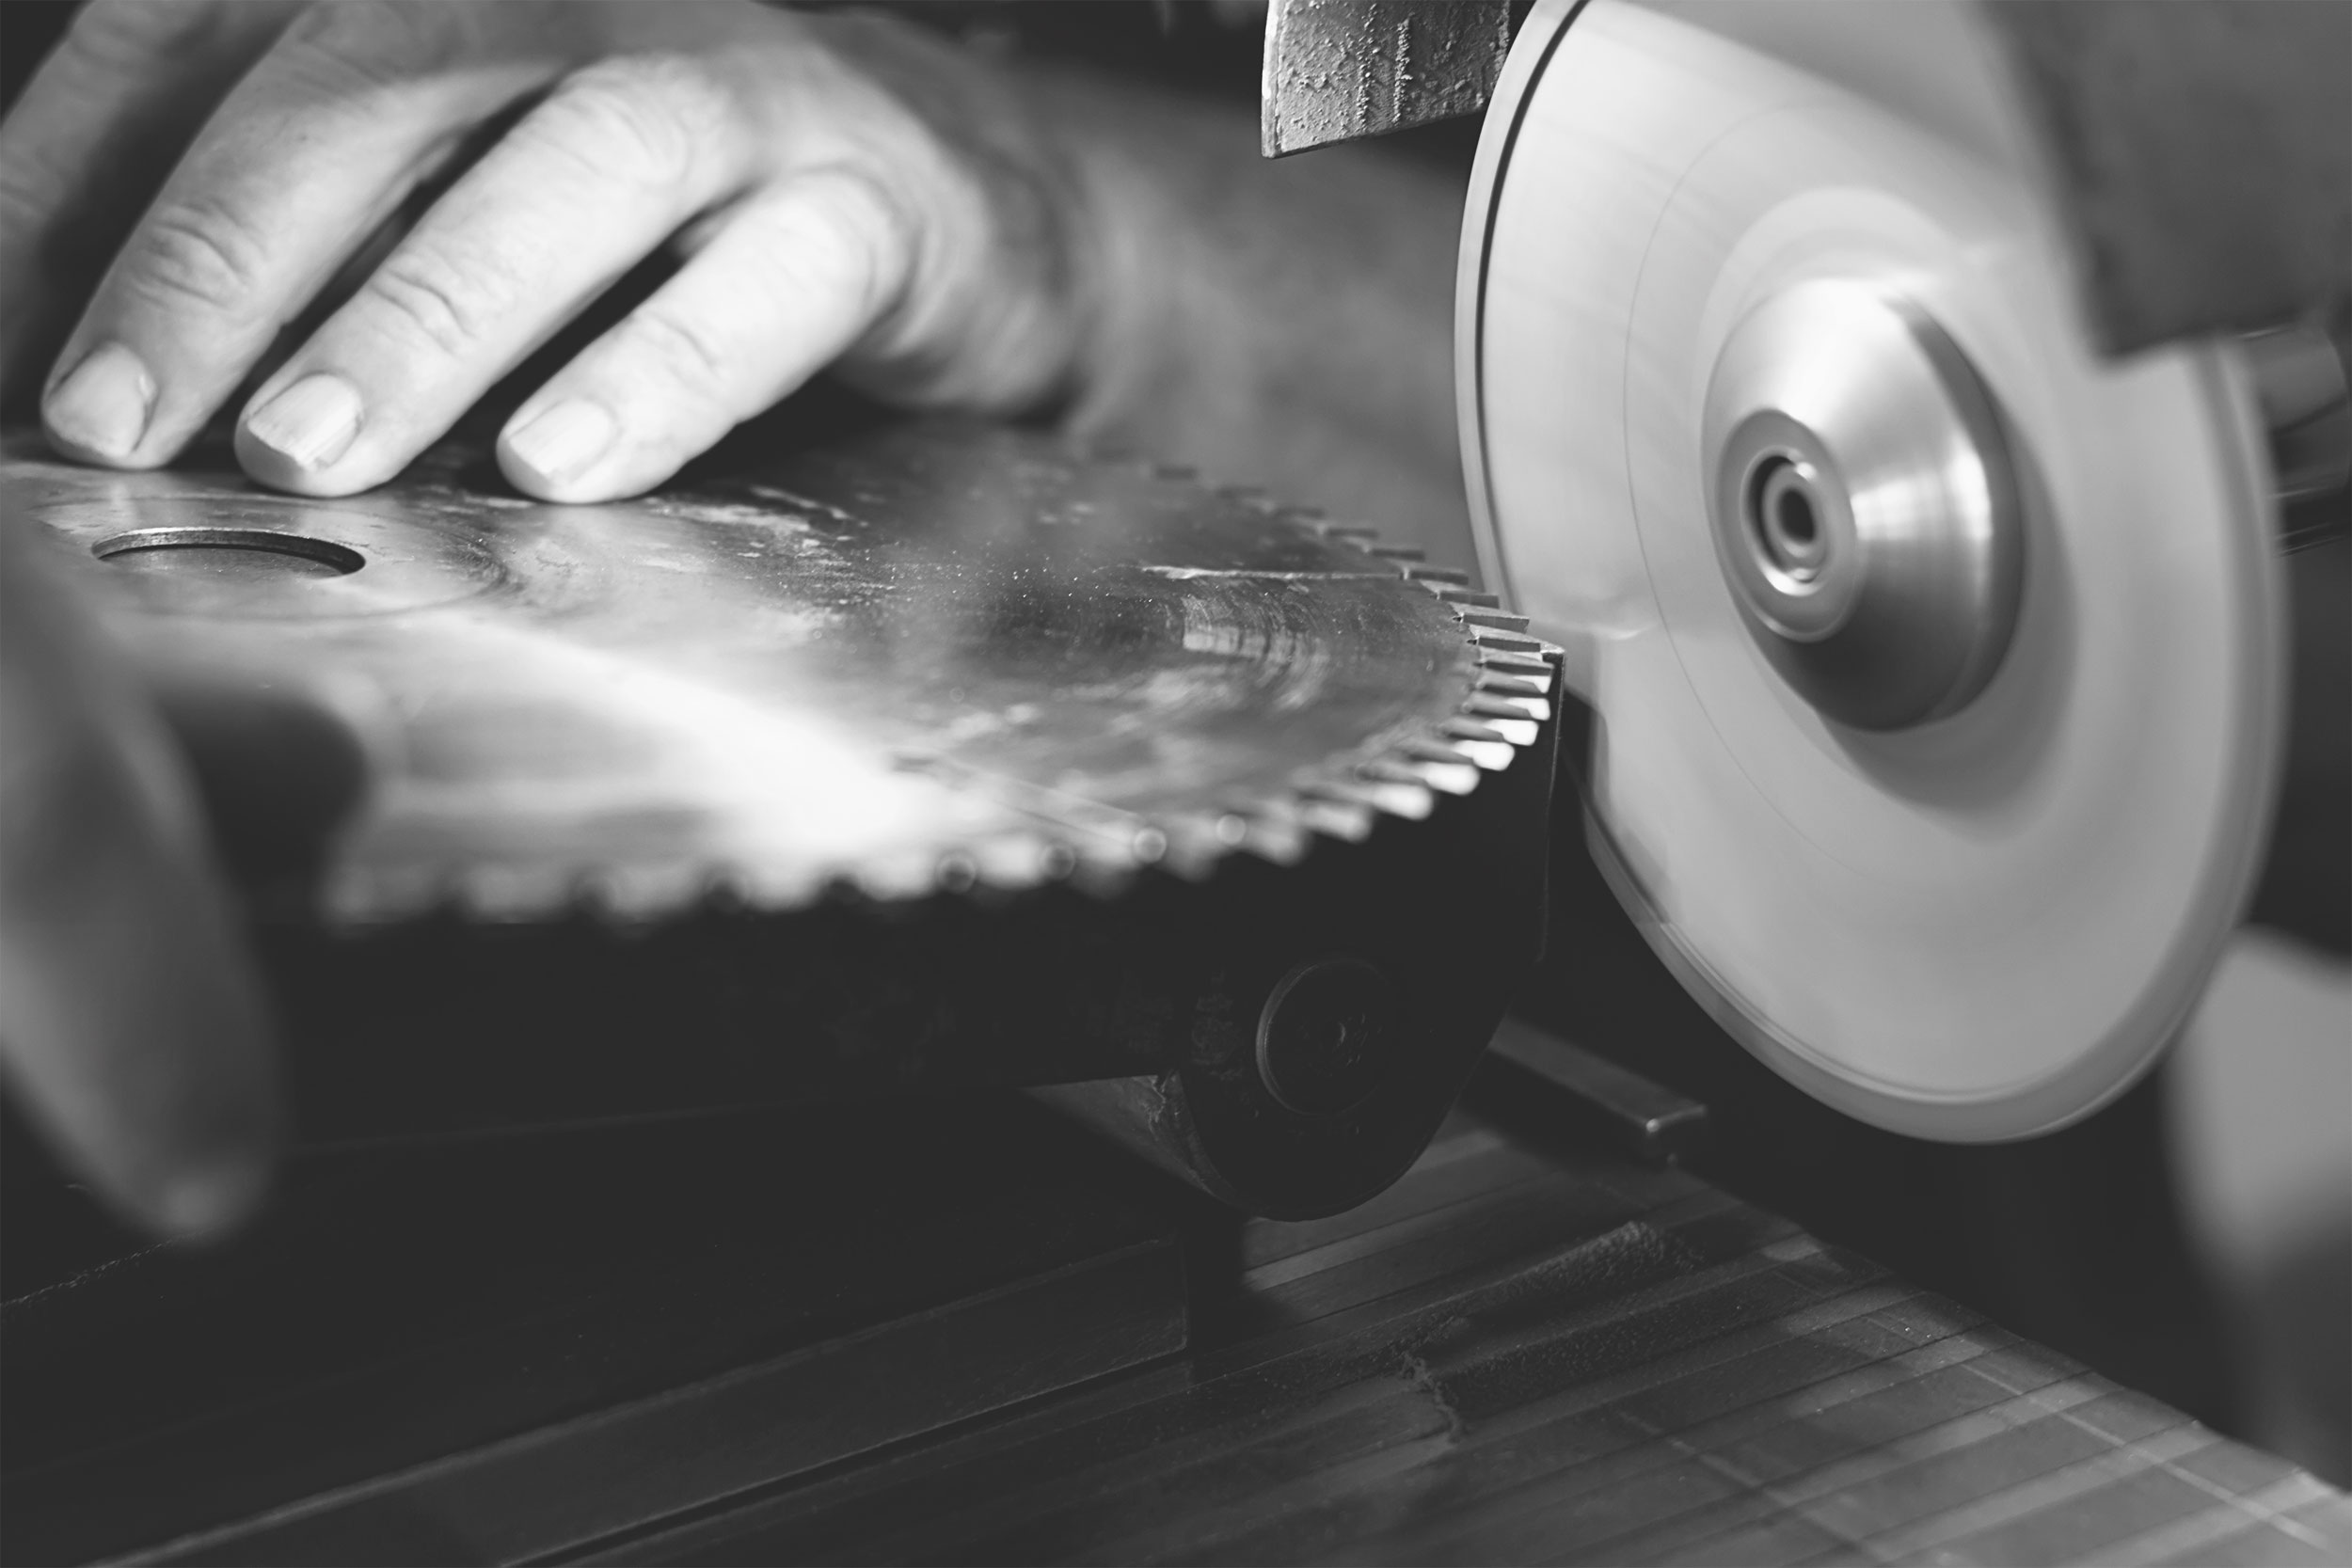 Grinder sharpening tool blades